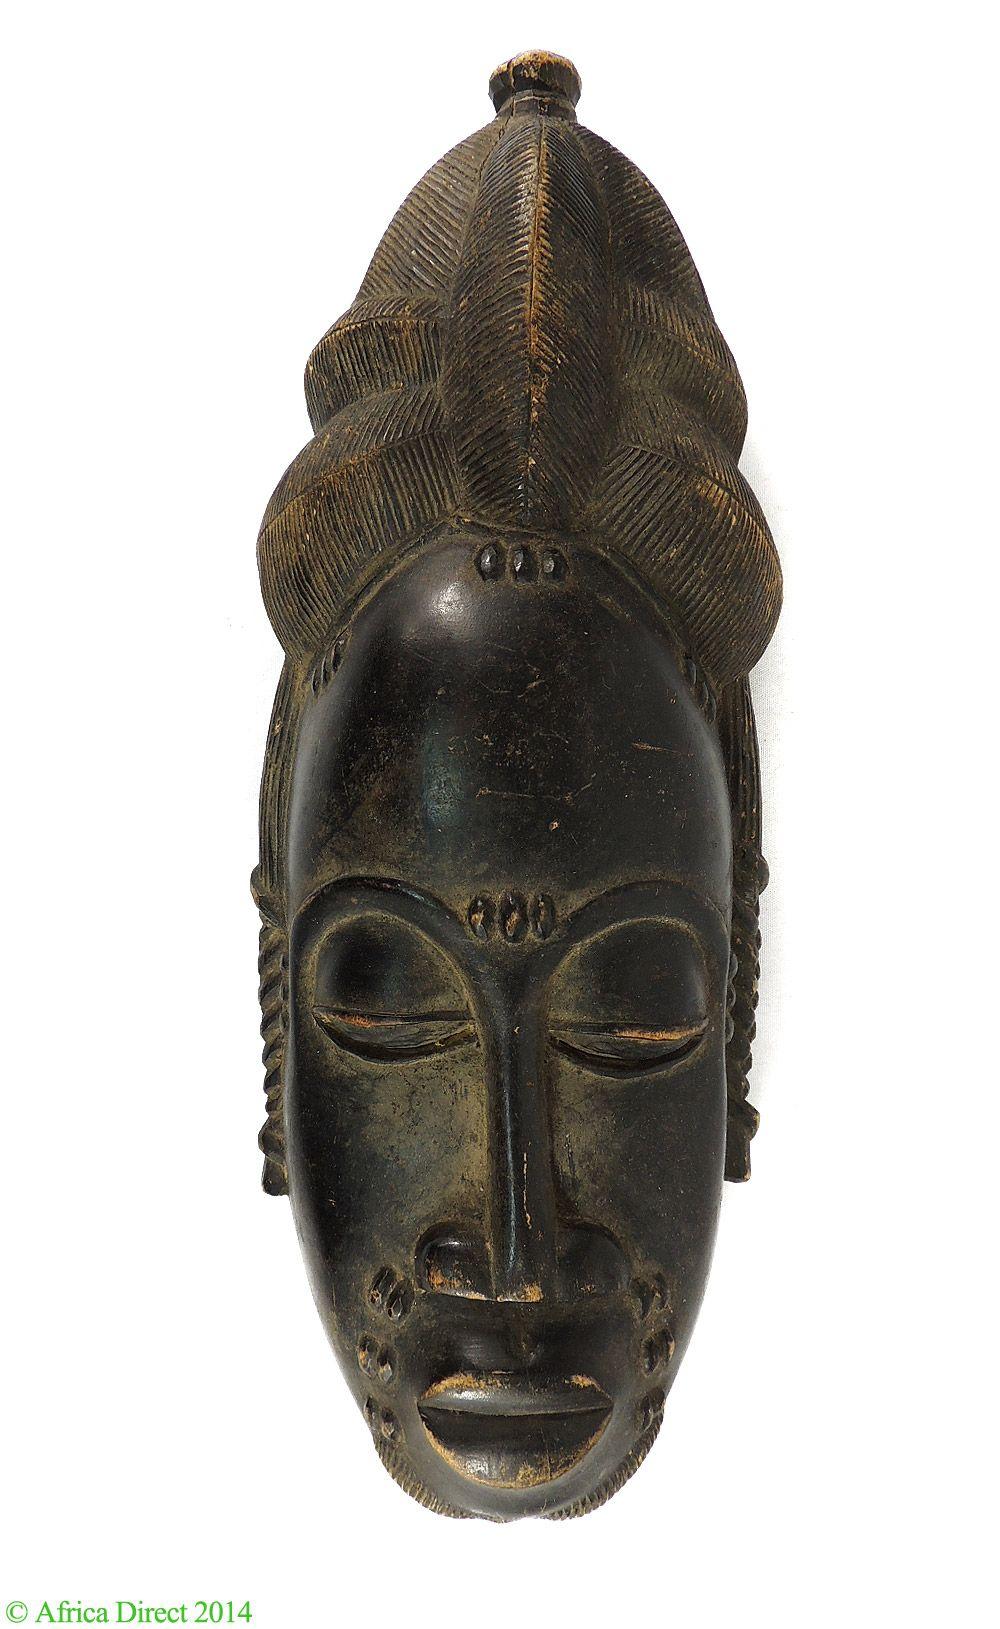 Baule Portrait Mask Finial Hairstyle Africa - Baule, Guro - African Masks